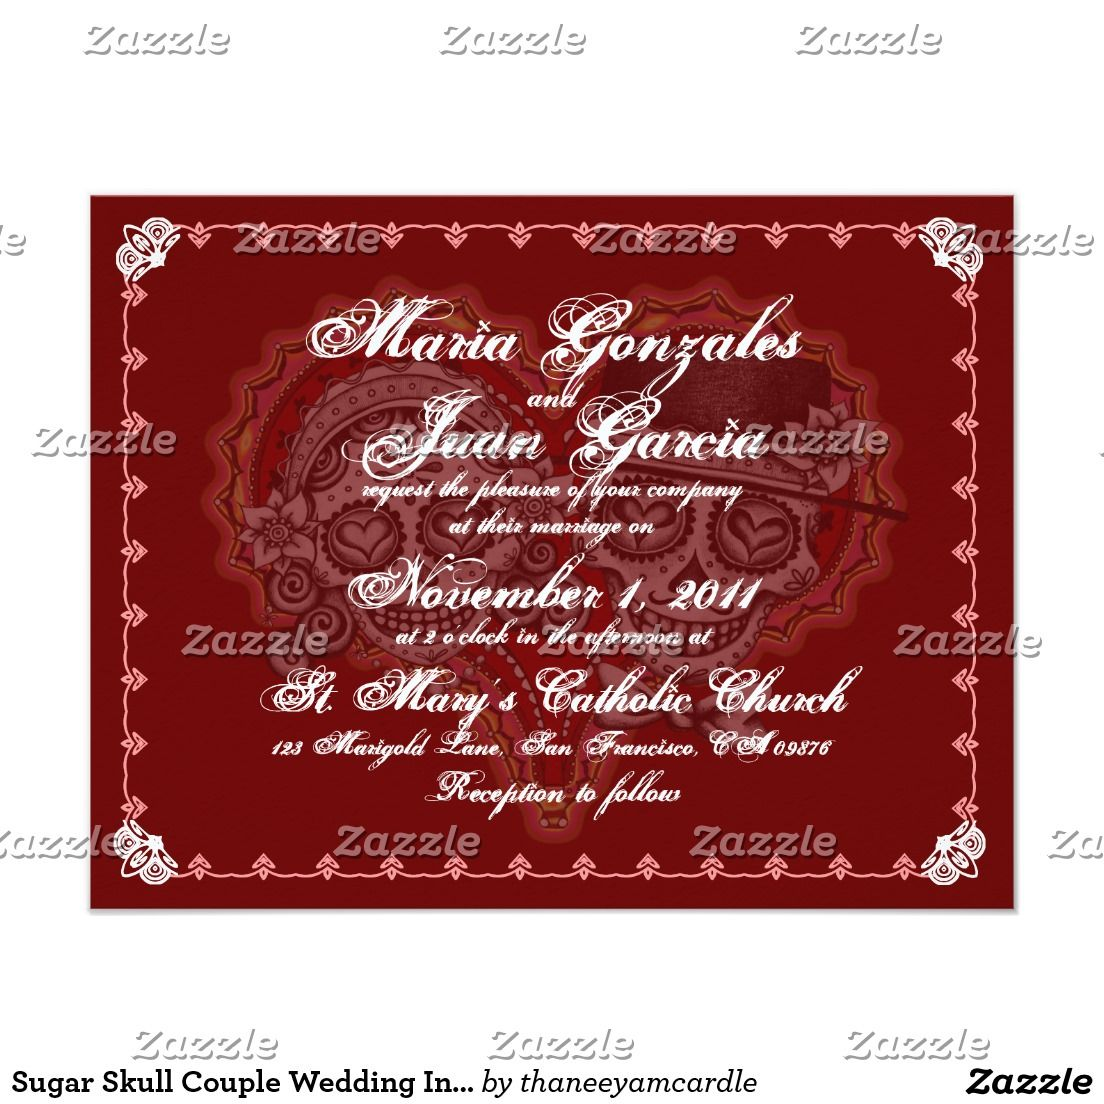 Sugar Skull Couple Wedding Invitations | Couples and Wedding